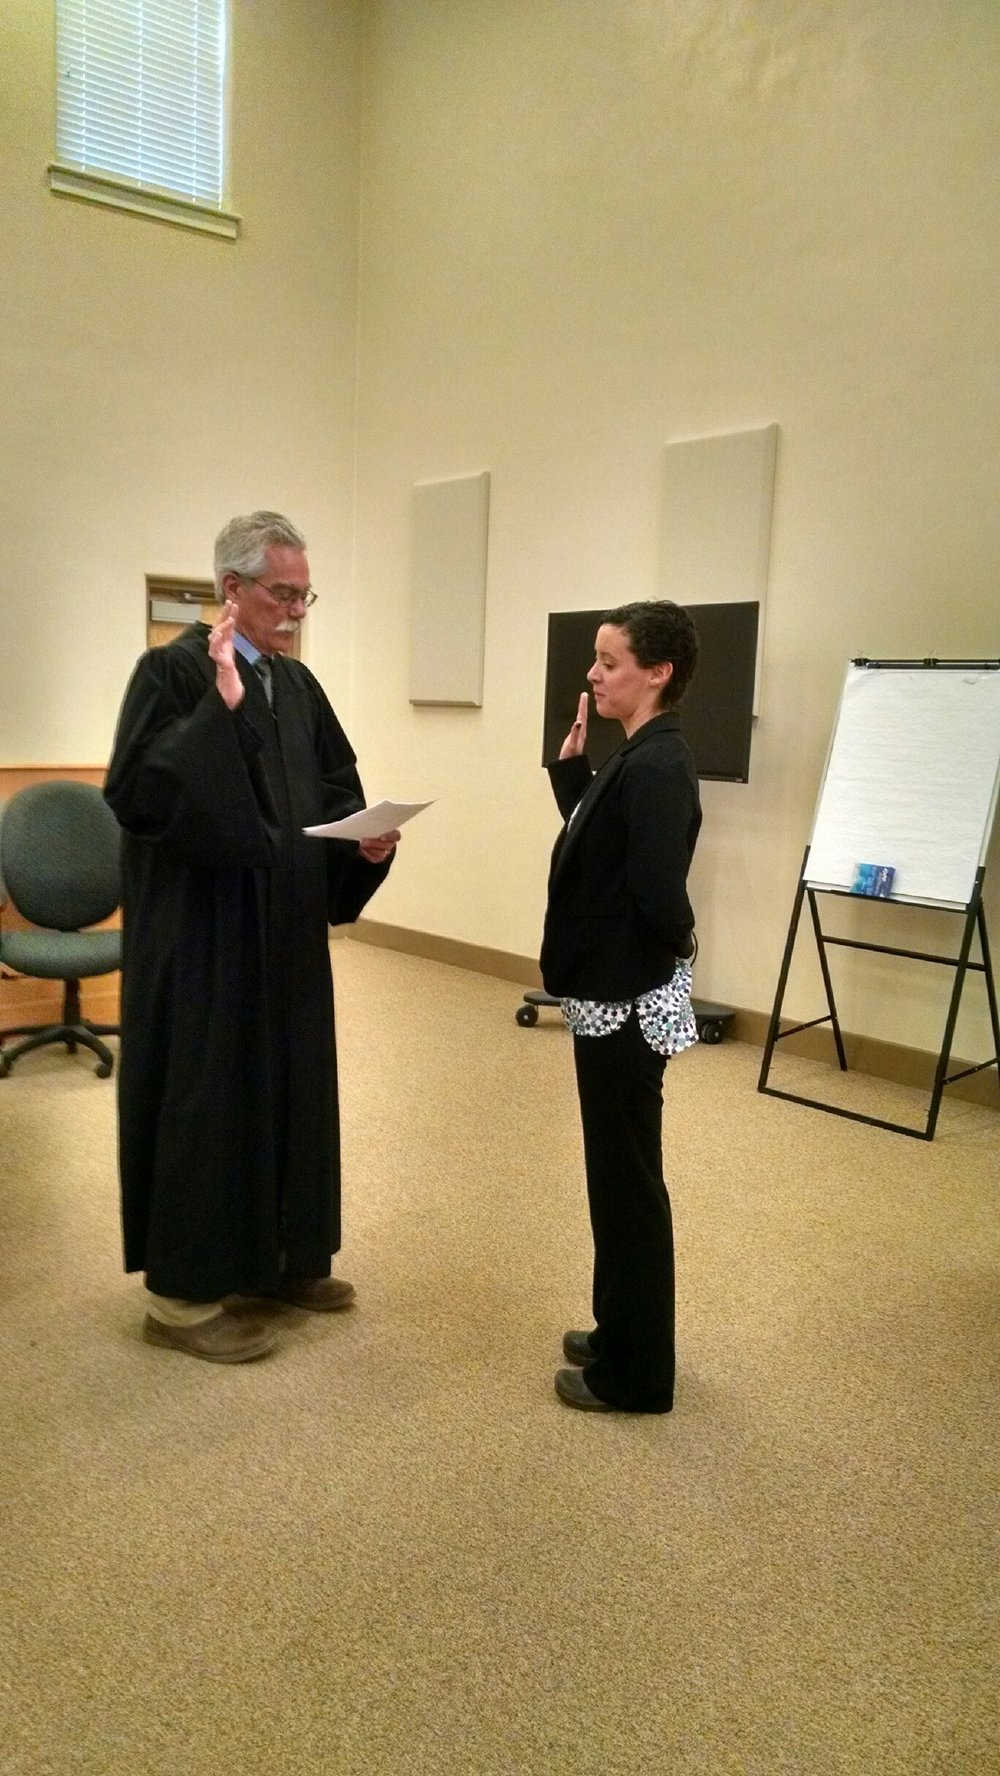 Volunteer Maria Weir is sworn in by Judge Matthew Reynolds.